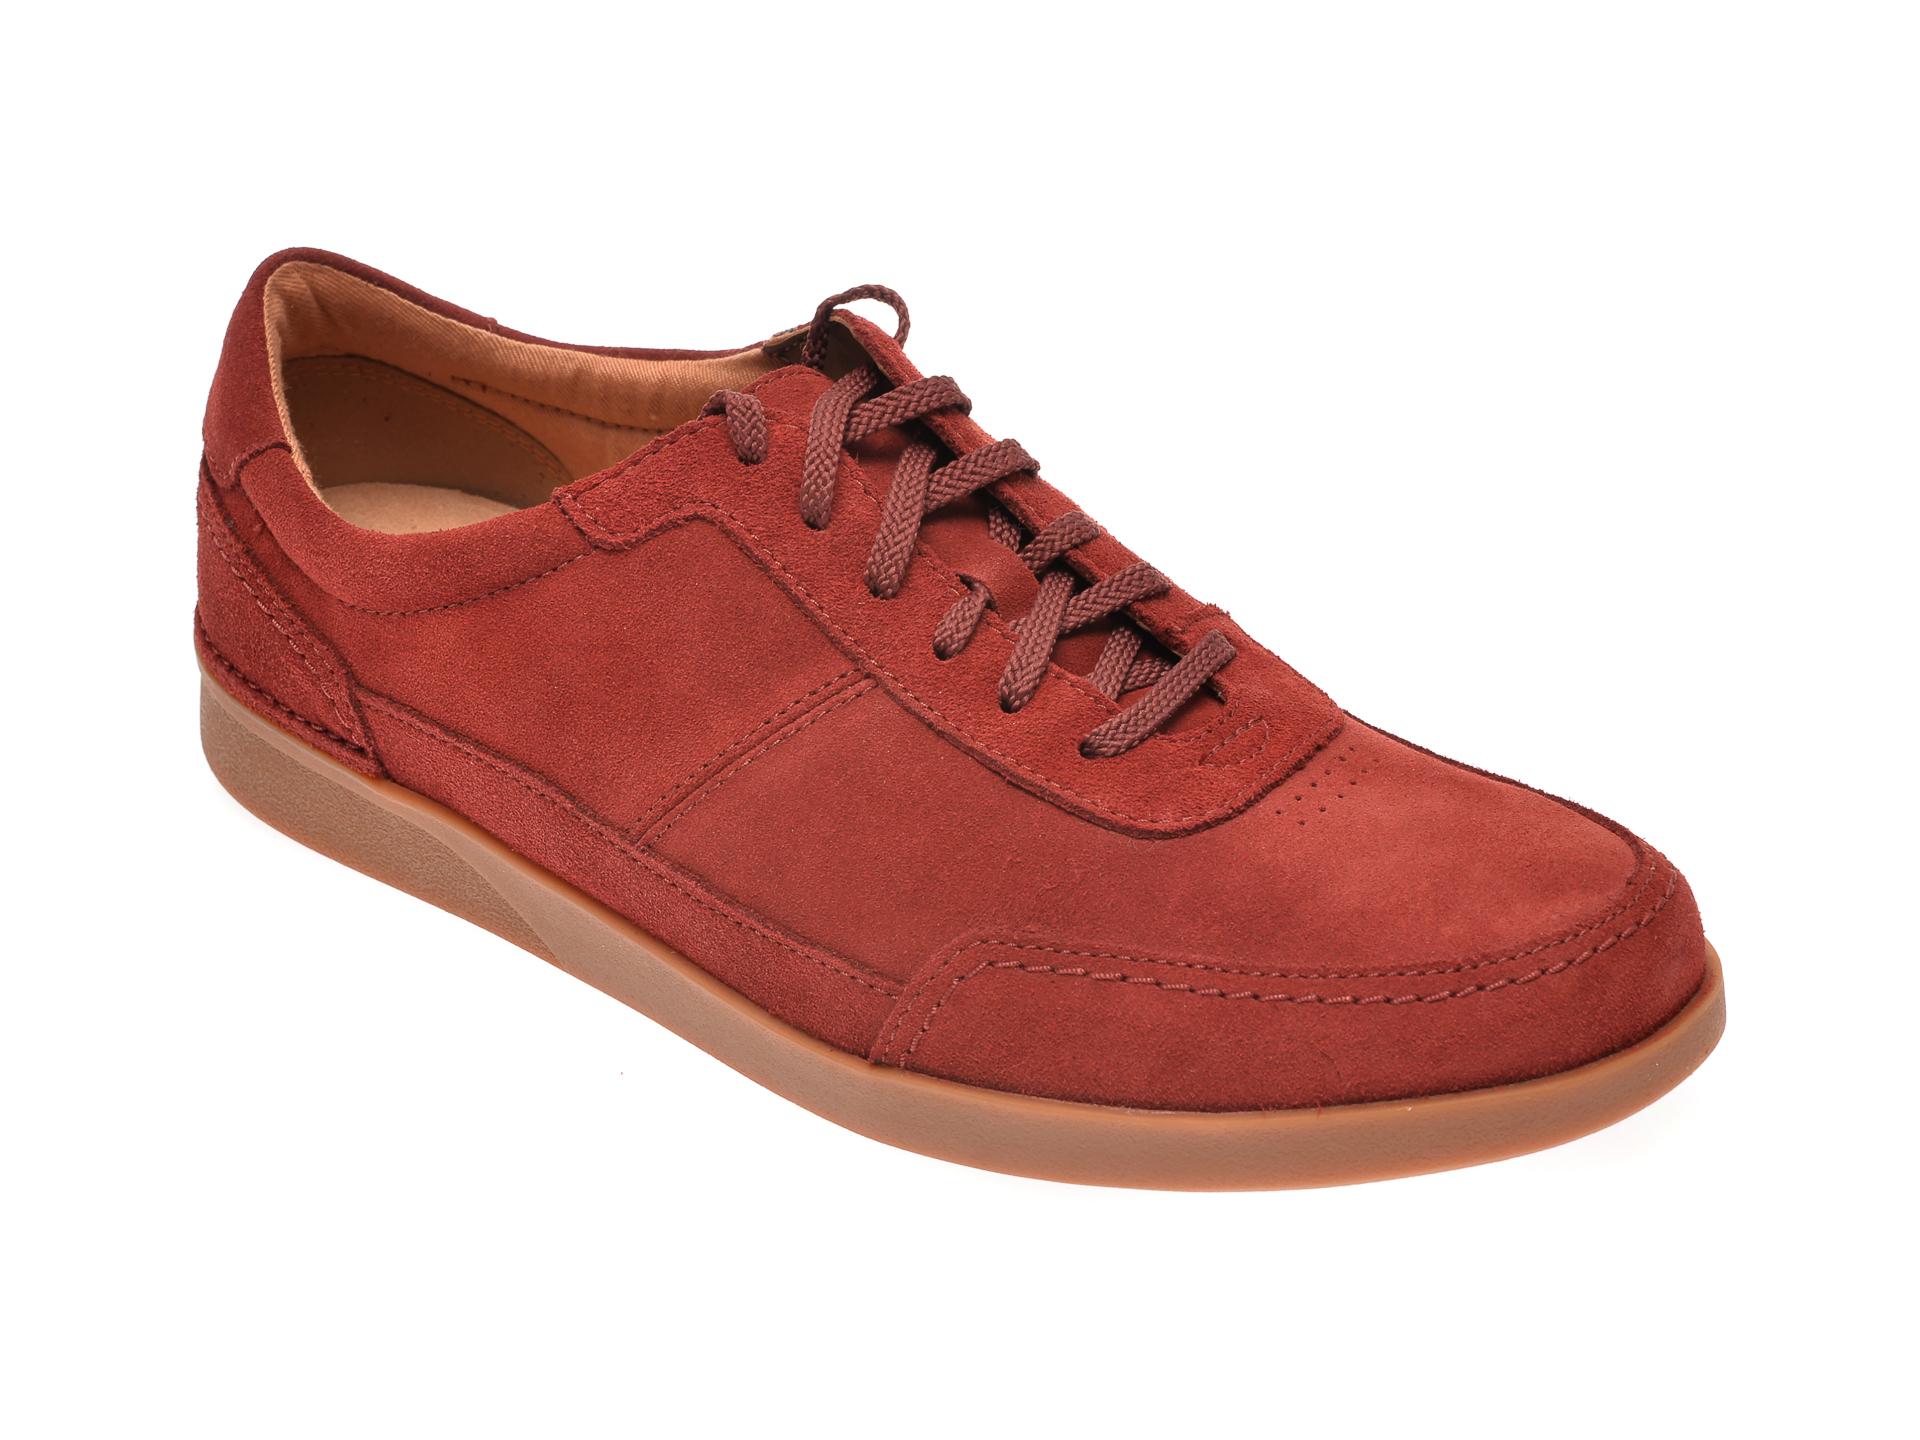 Pantofi CLARKS rosii, Oakland Run, din piele intoarsa